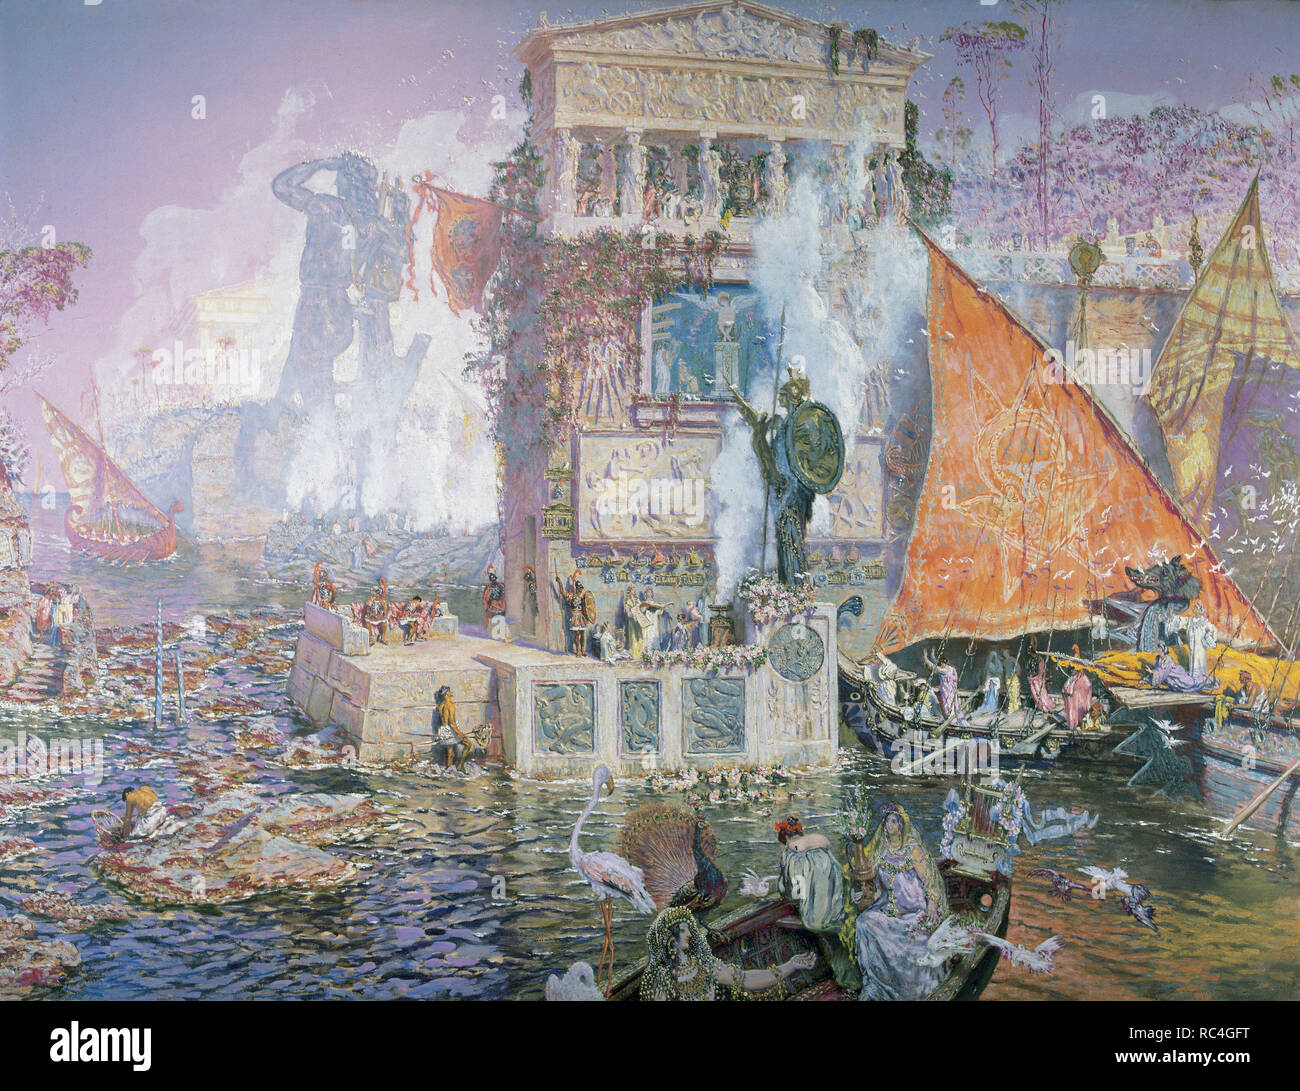 Antonio Munoz Degrain (1843-1808). Spanish painter. The Colossus of Rhodes. Royal Academy of Fine Arts of San Fernando. Madrid. Spain. - Stock Image